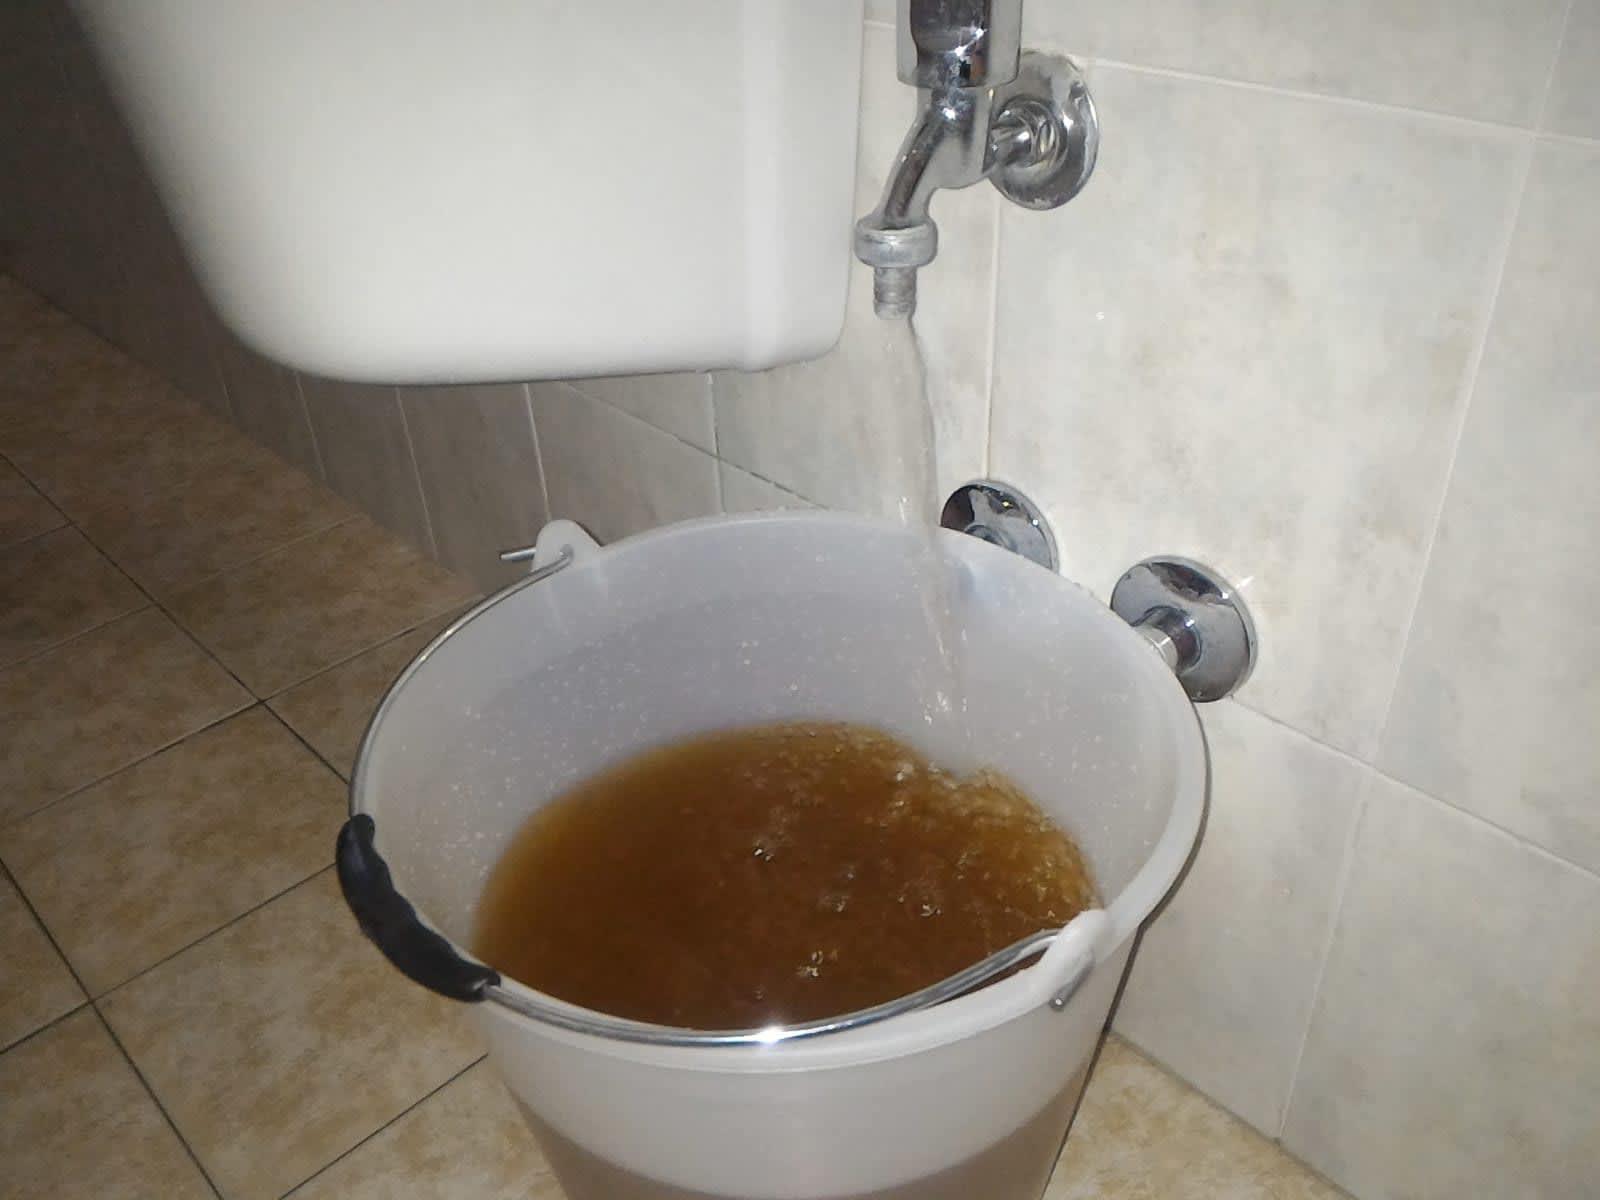 Impianto acqua sanitaria: le Soluzioni Rentacs